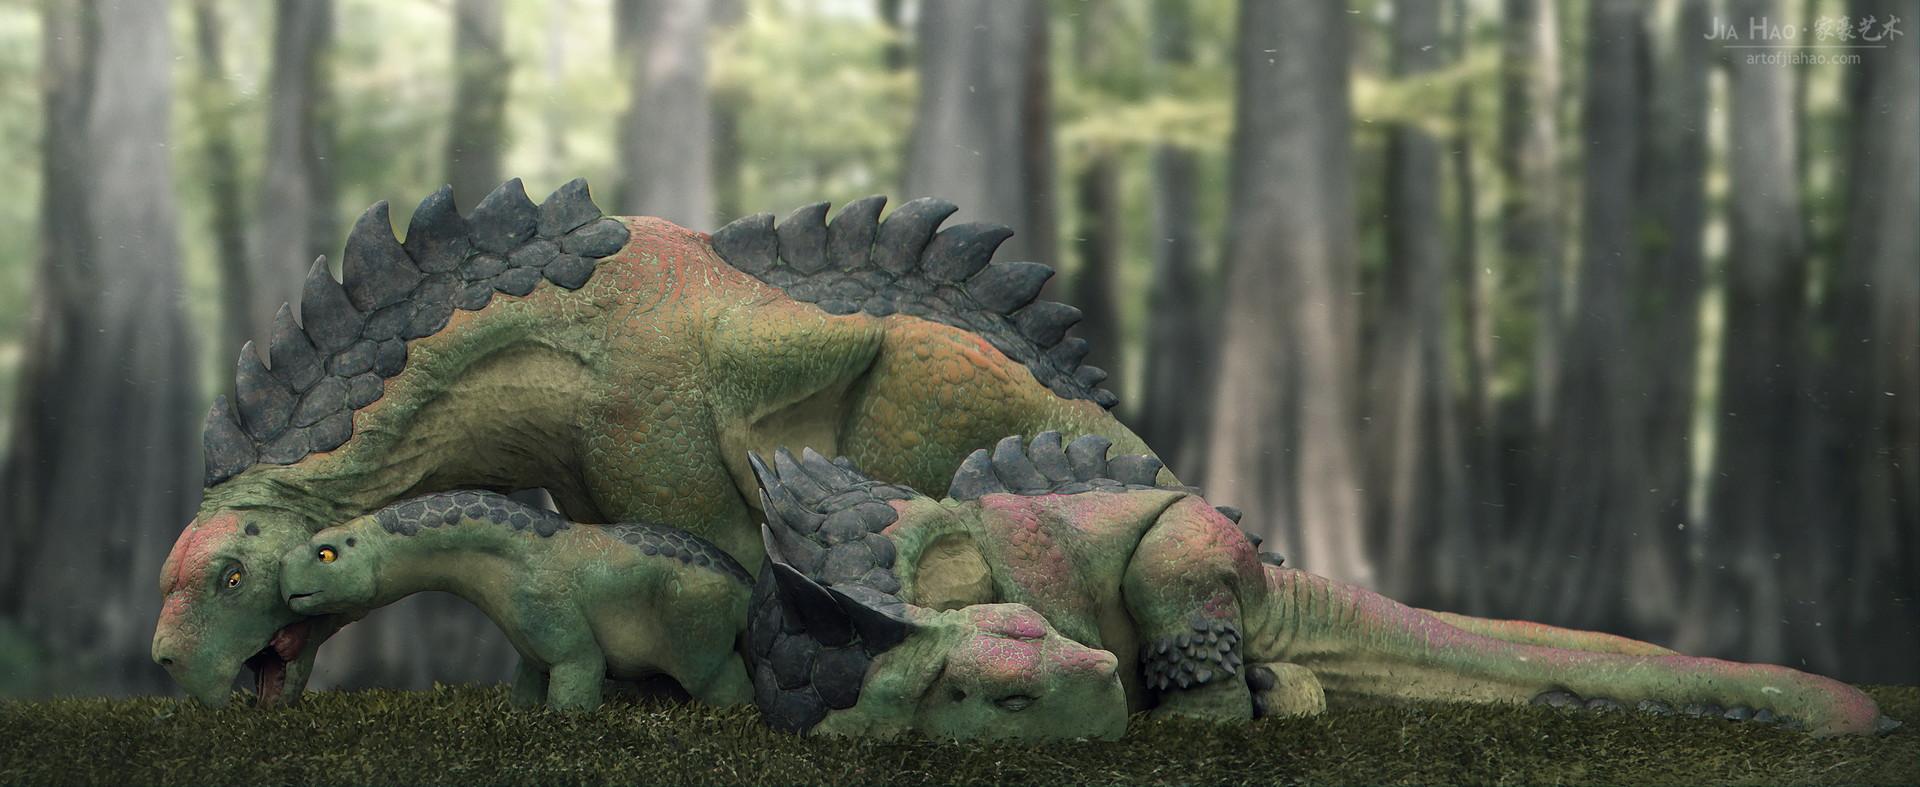 Jia hao 2017 tortoisaurus comp 01